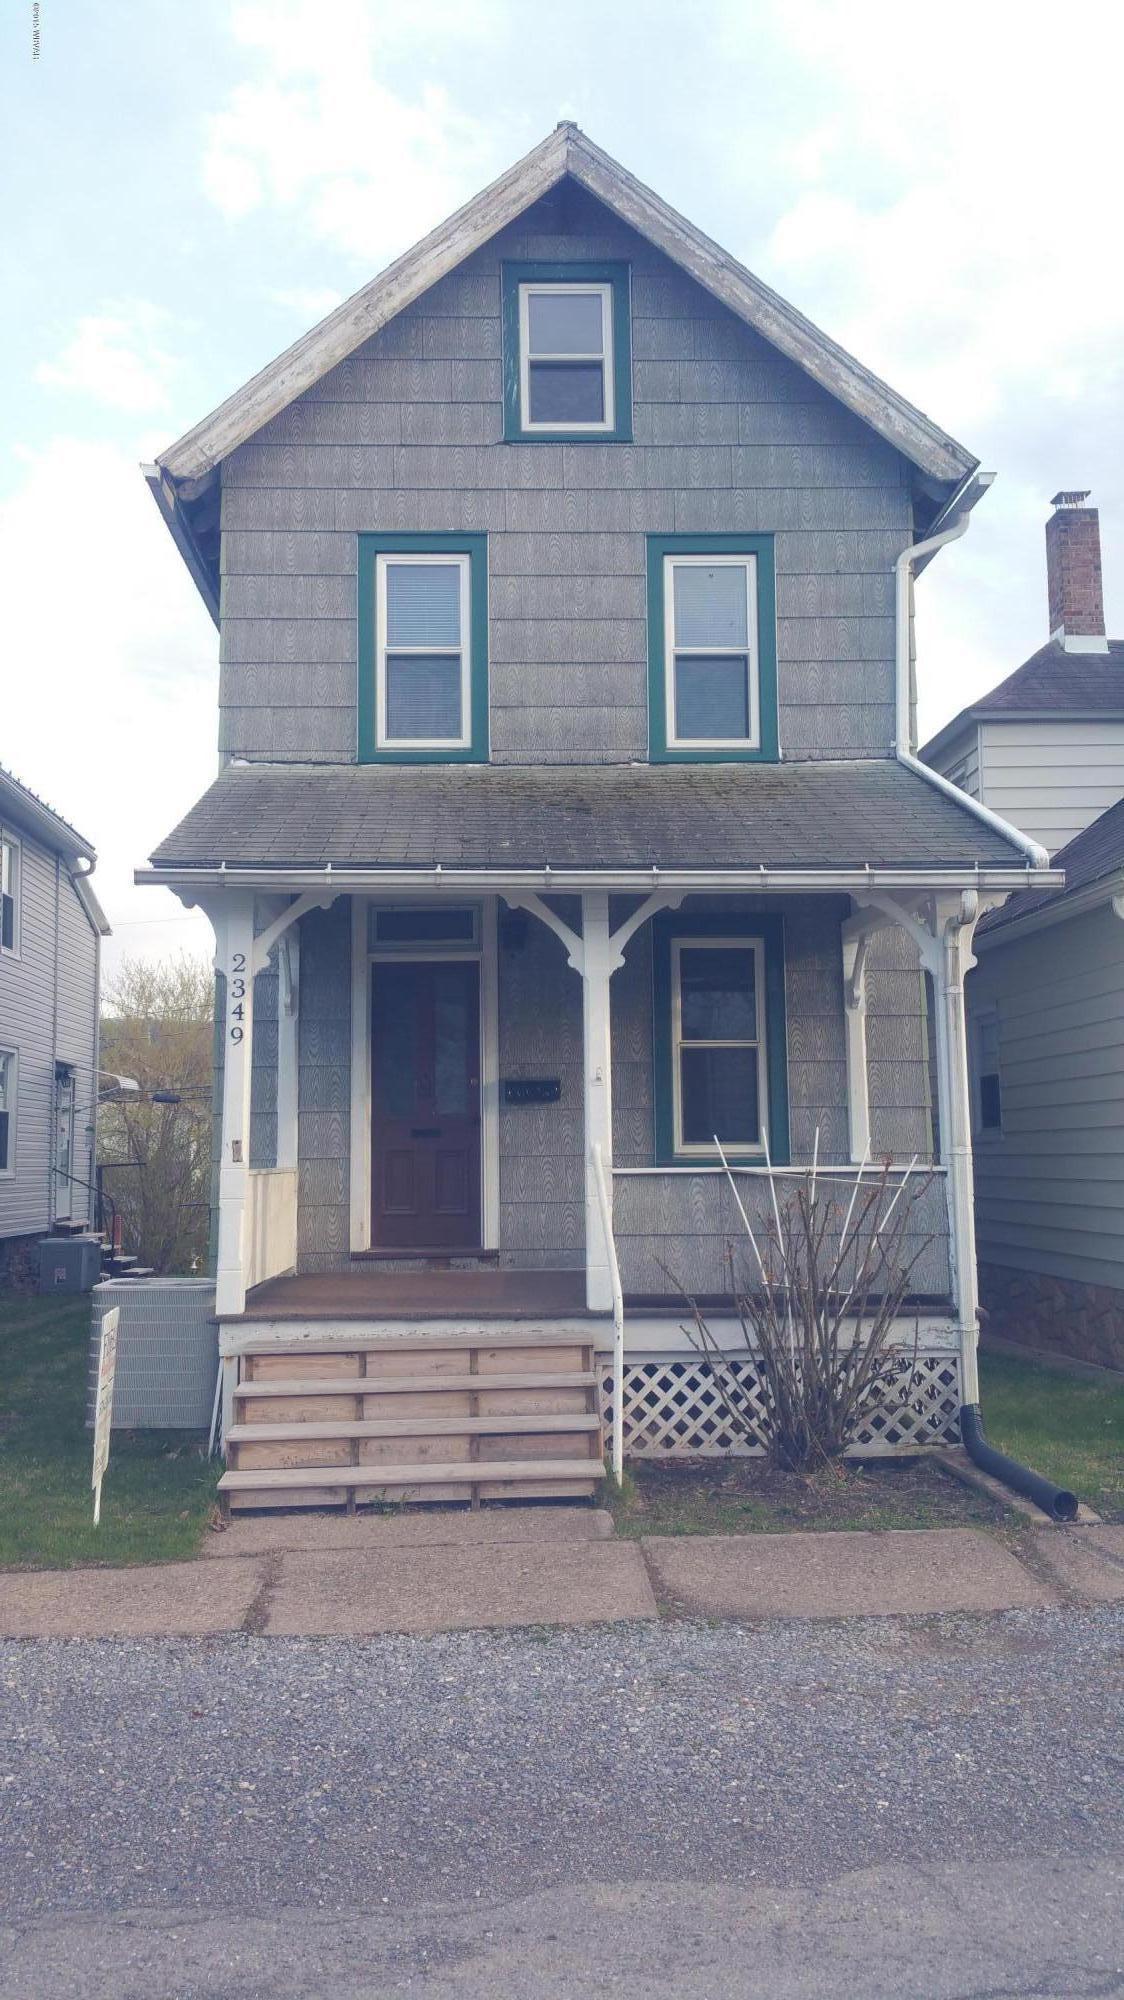 2349 GRAND STREET,Williamsport,PA 17701,3 Bedrooms Bedrooms,1.5 BathroomsBathrooms,Residential,GRAND,WB-73899